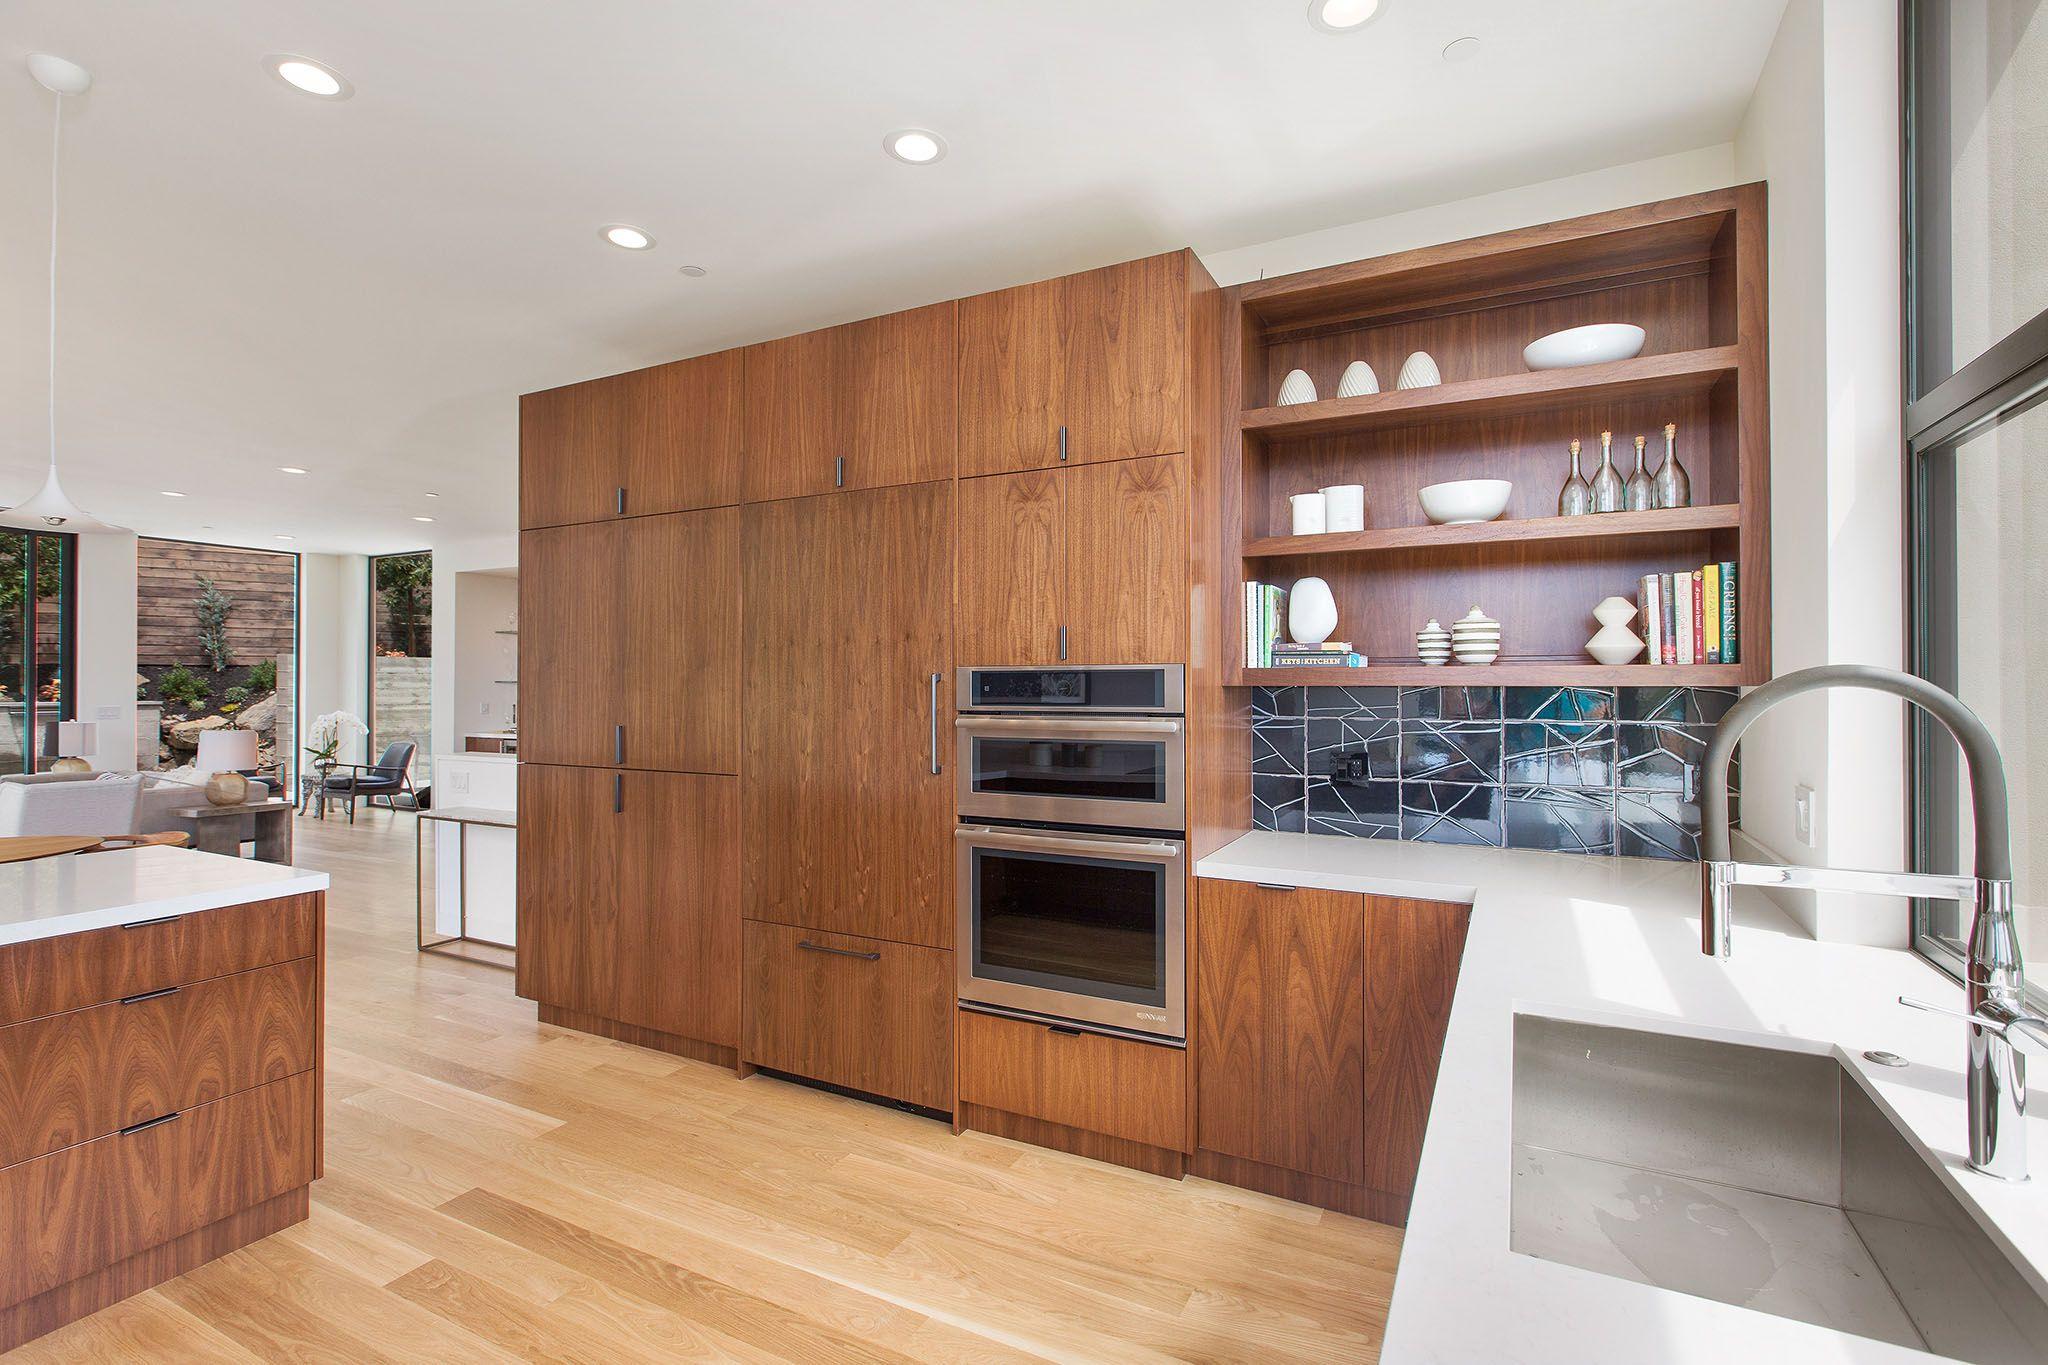 5750 Golden Gate Avenue Oakland Presented By Mavis Delacroix Www 5750goldengateave Com Kitchen Kitchen Cabinets Home Decor